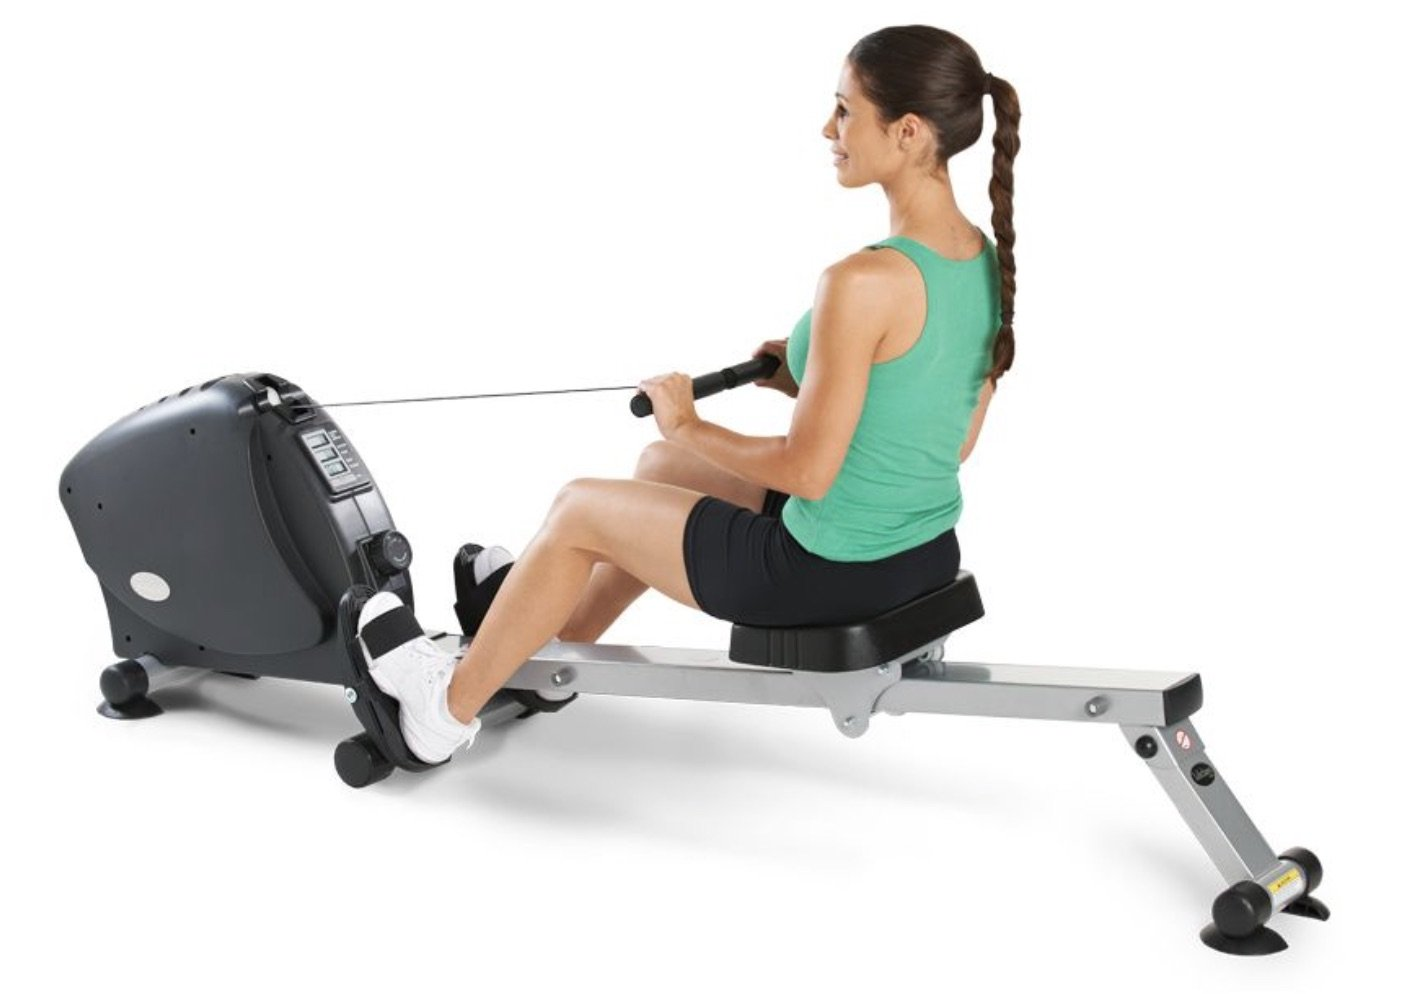 LifeSpan RW1000 Rowing Machine Quality